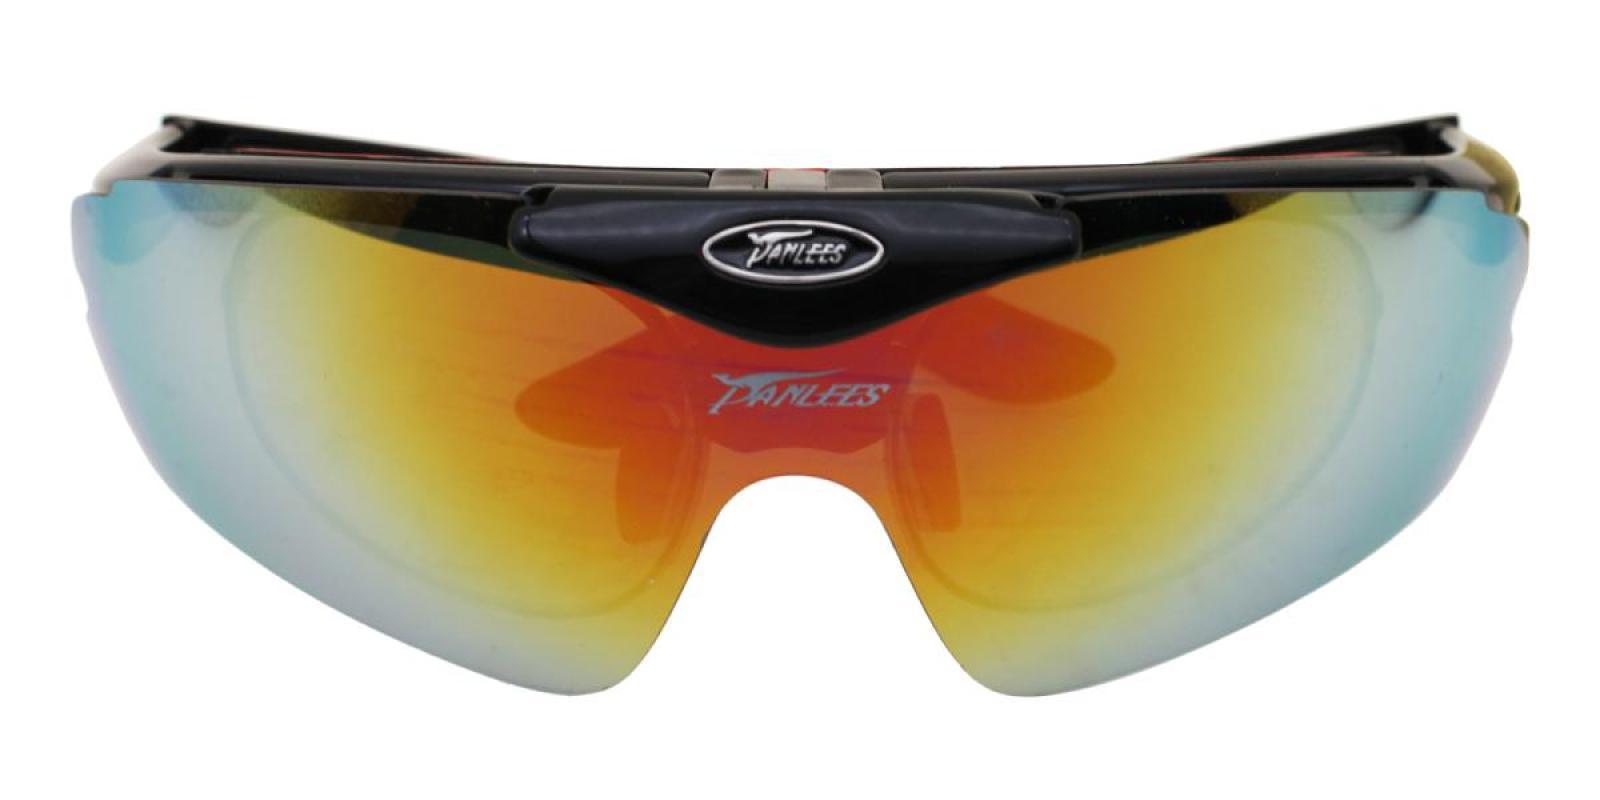 Vigor-Red-Square-Plastic-SportsGlasses-detail